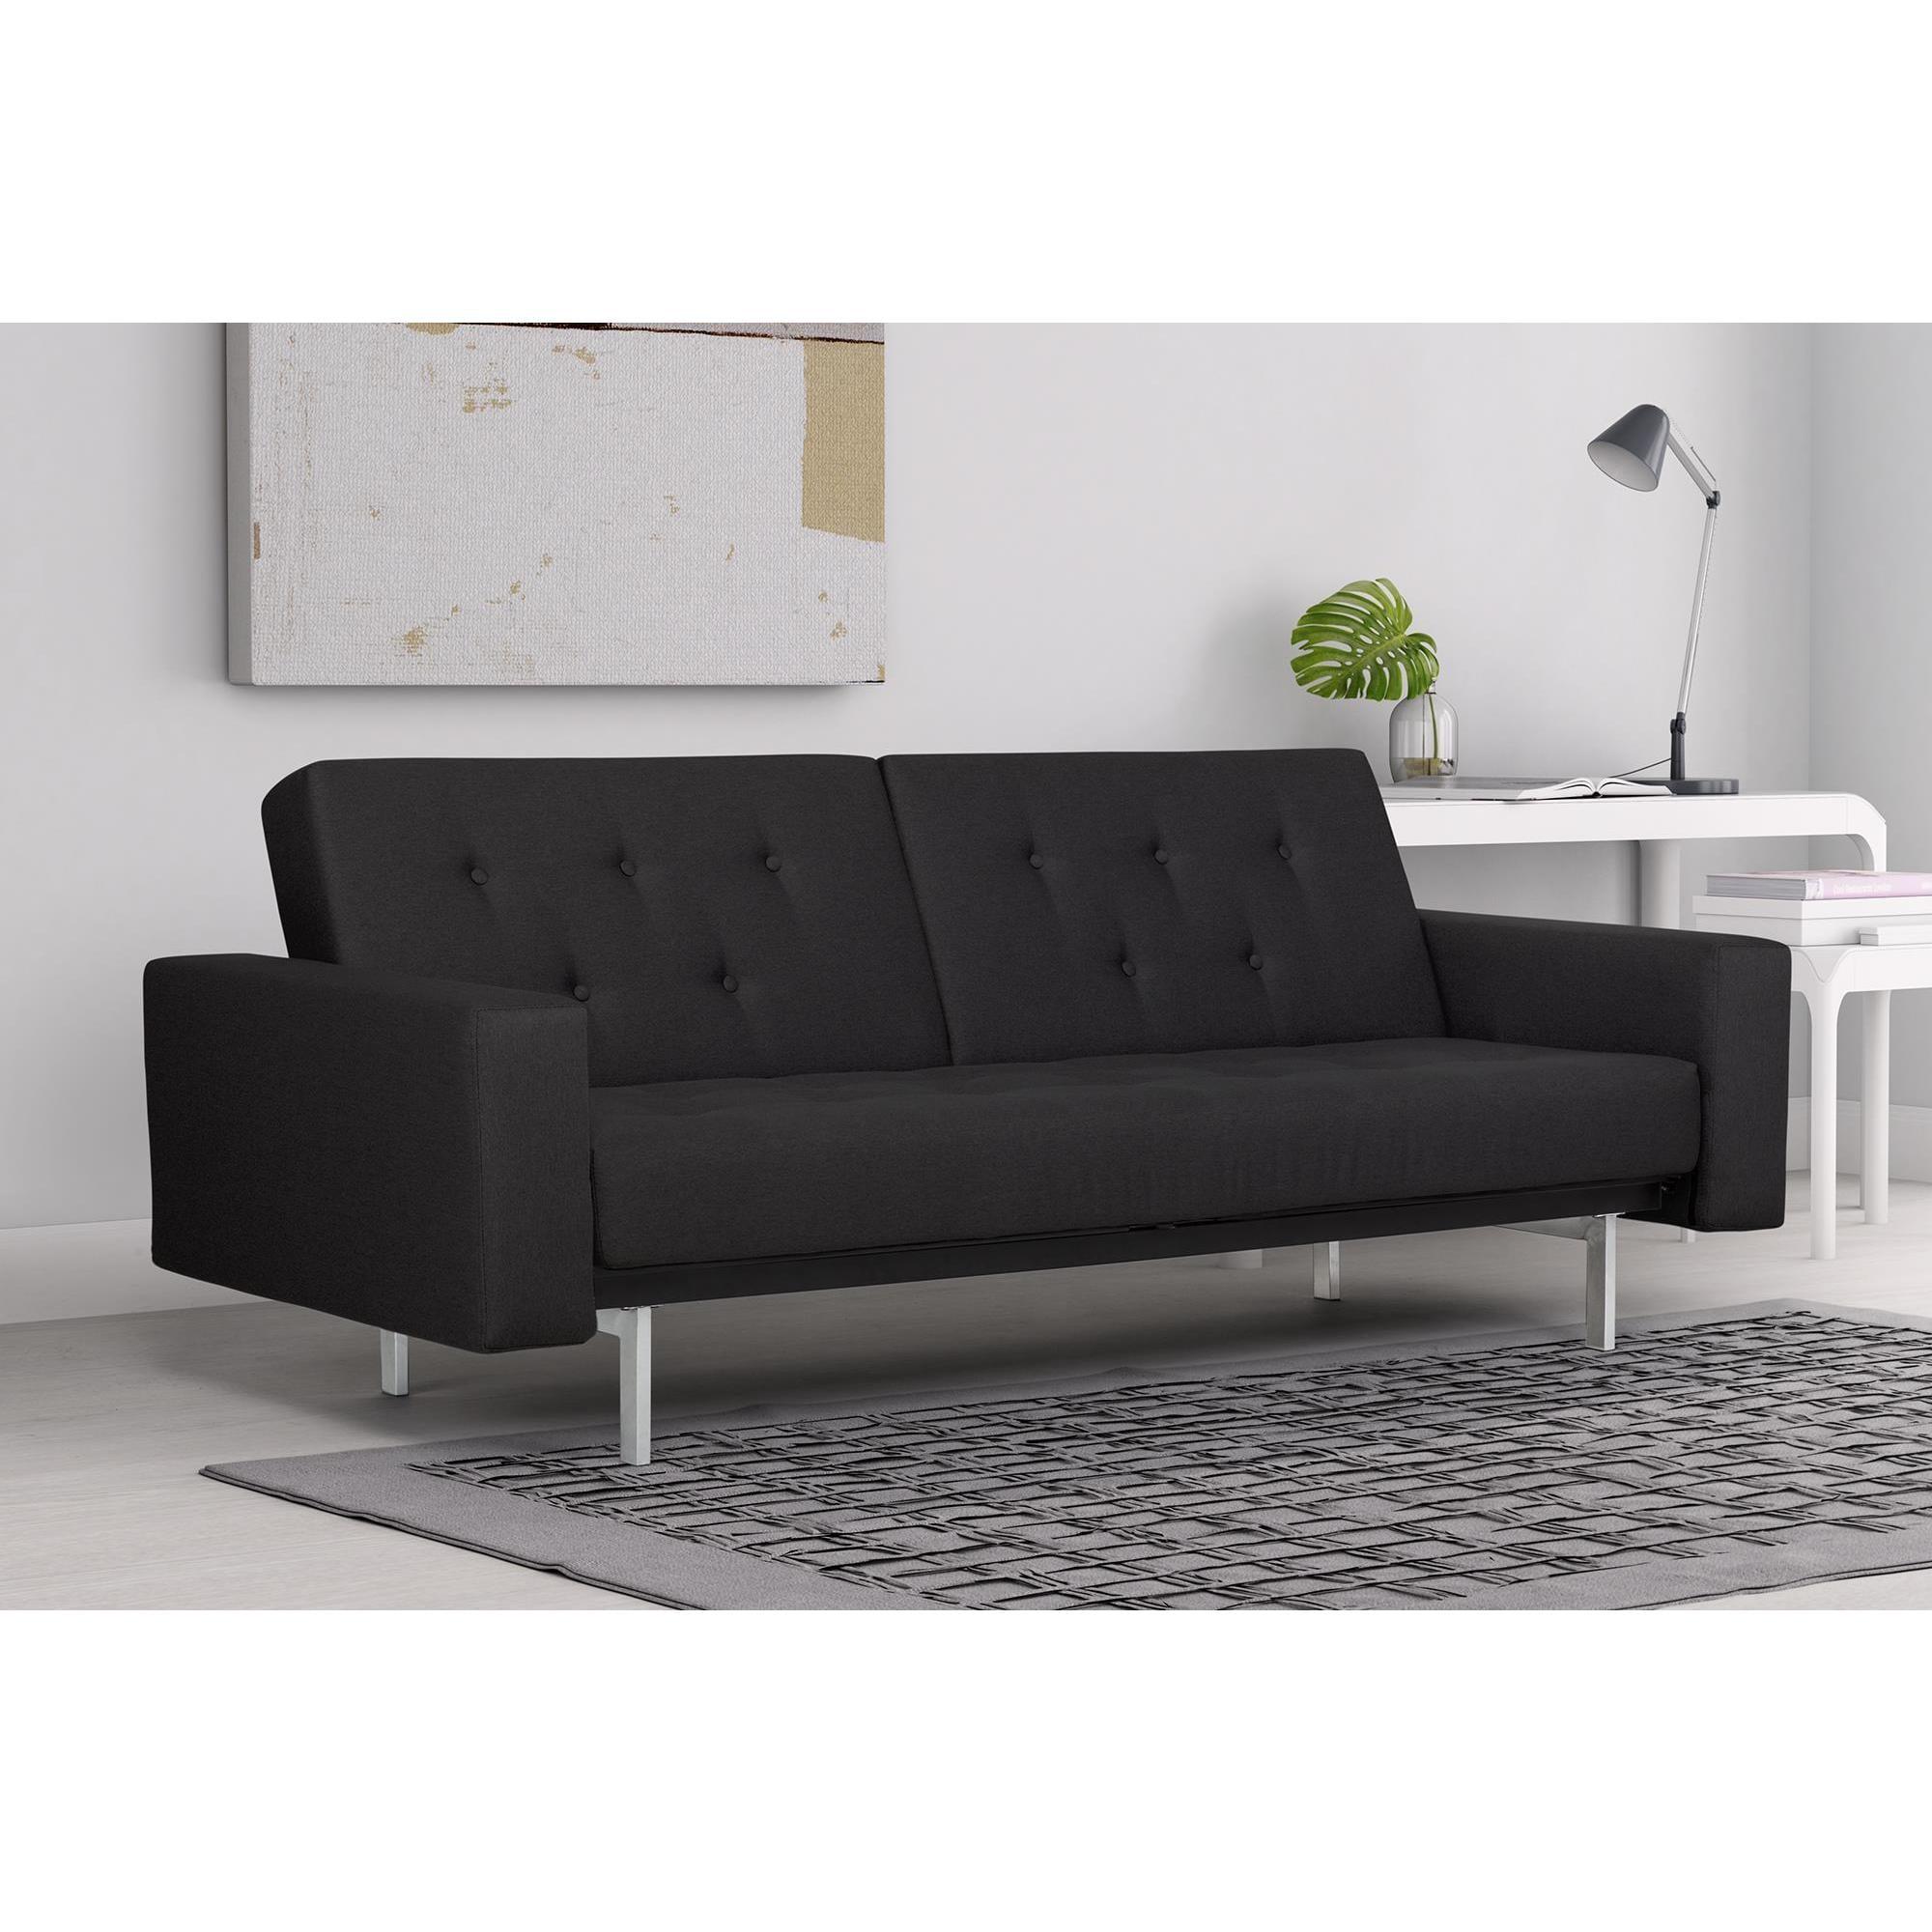 DHP Black Premium City Linen Queen Futon (Futon, black)